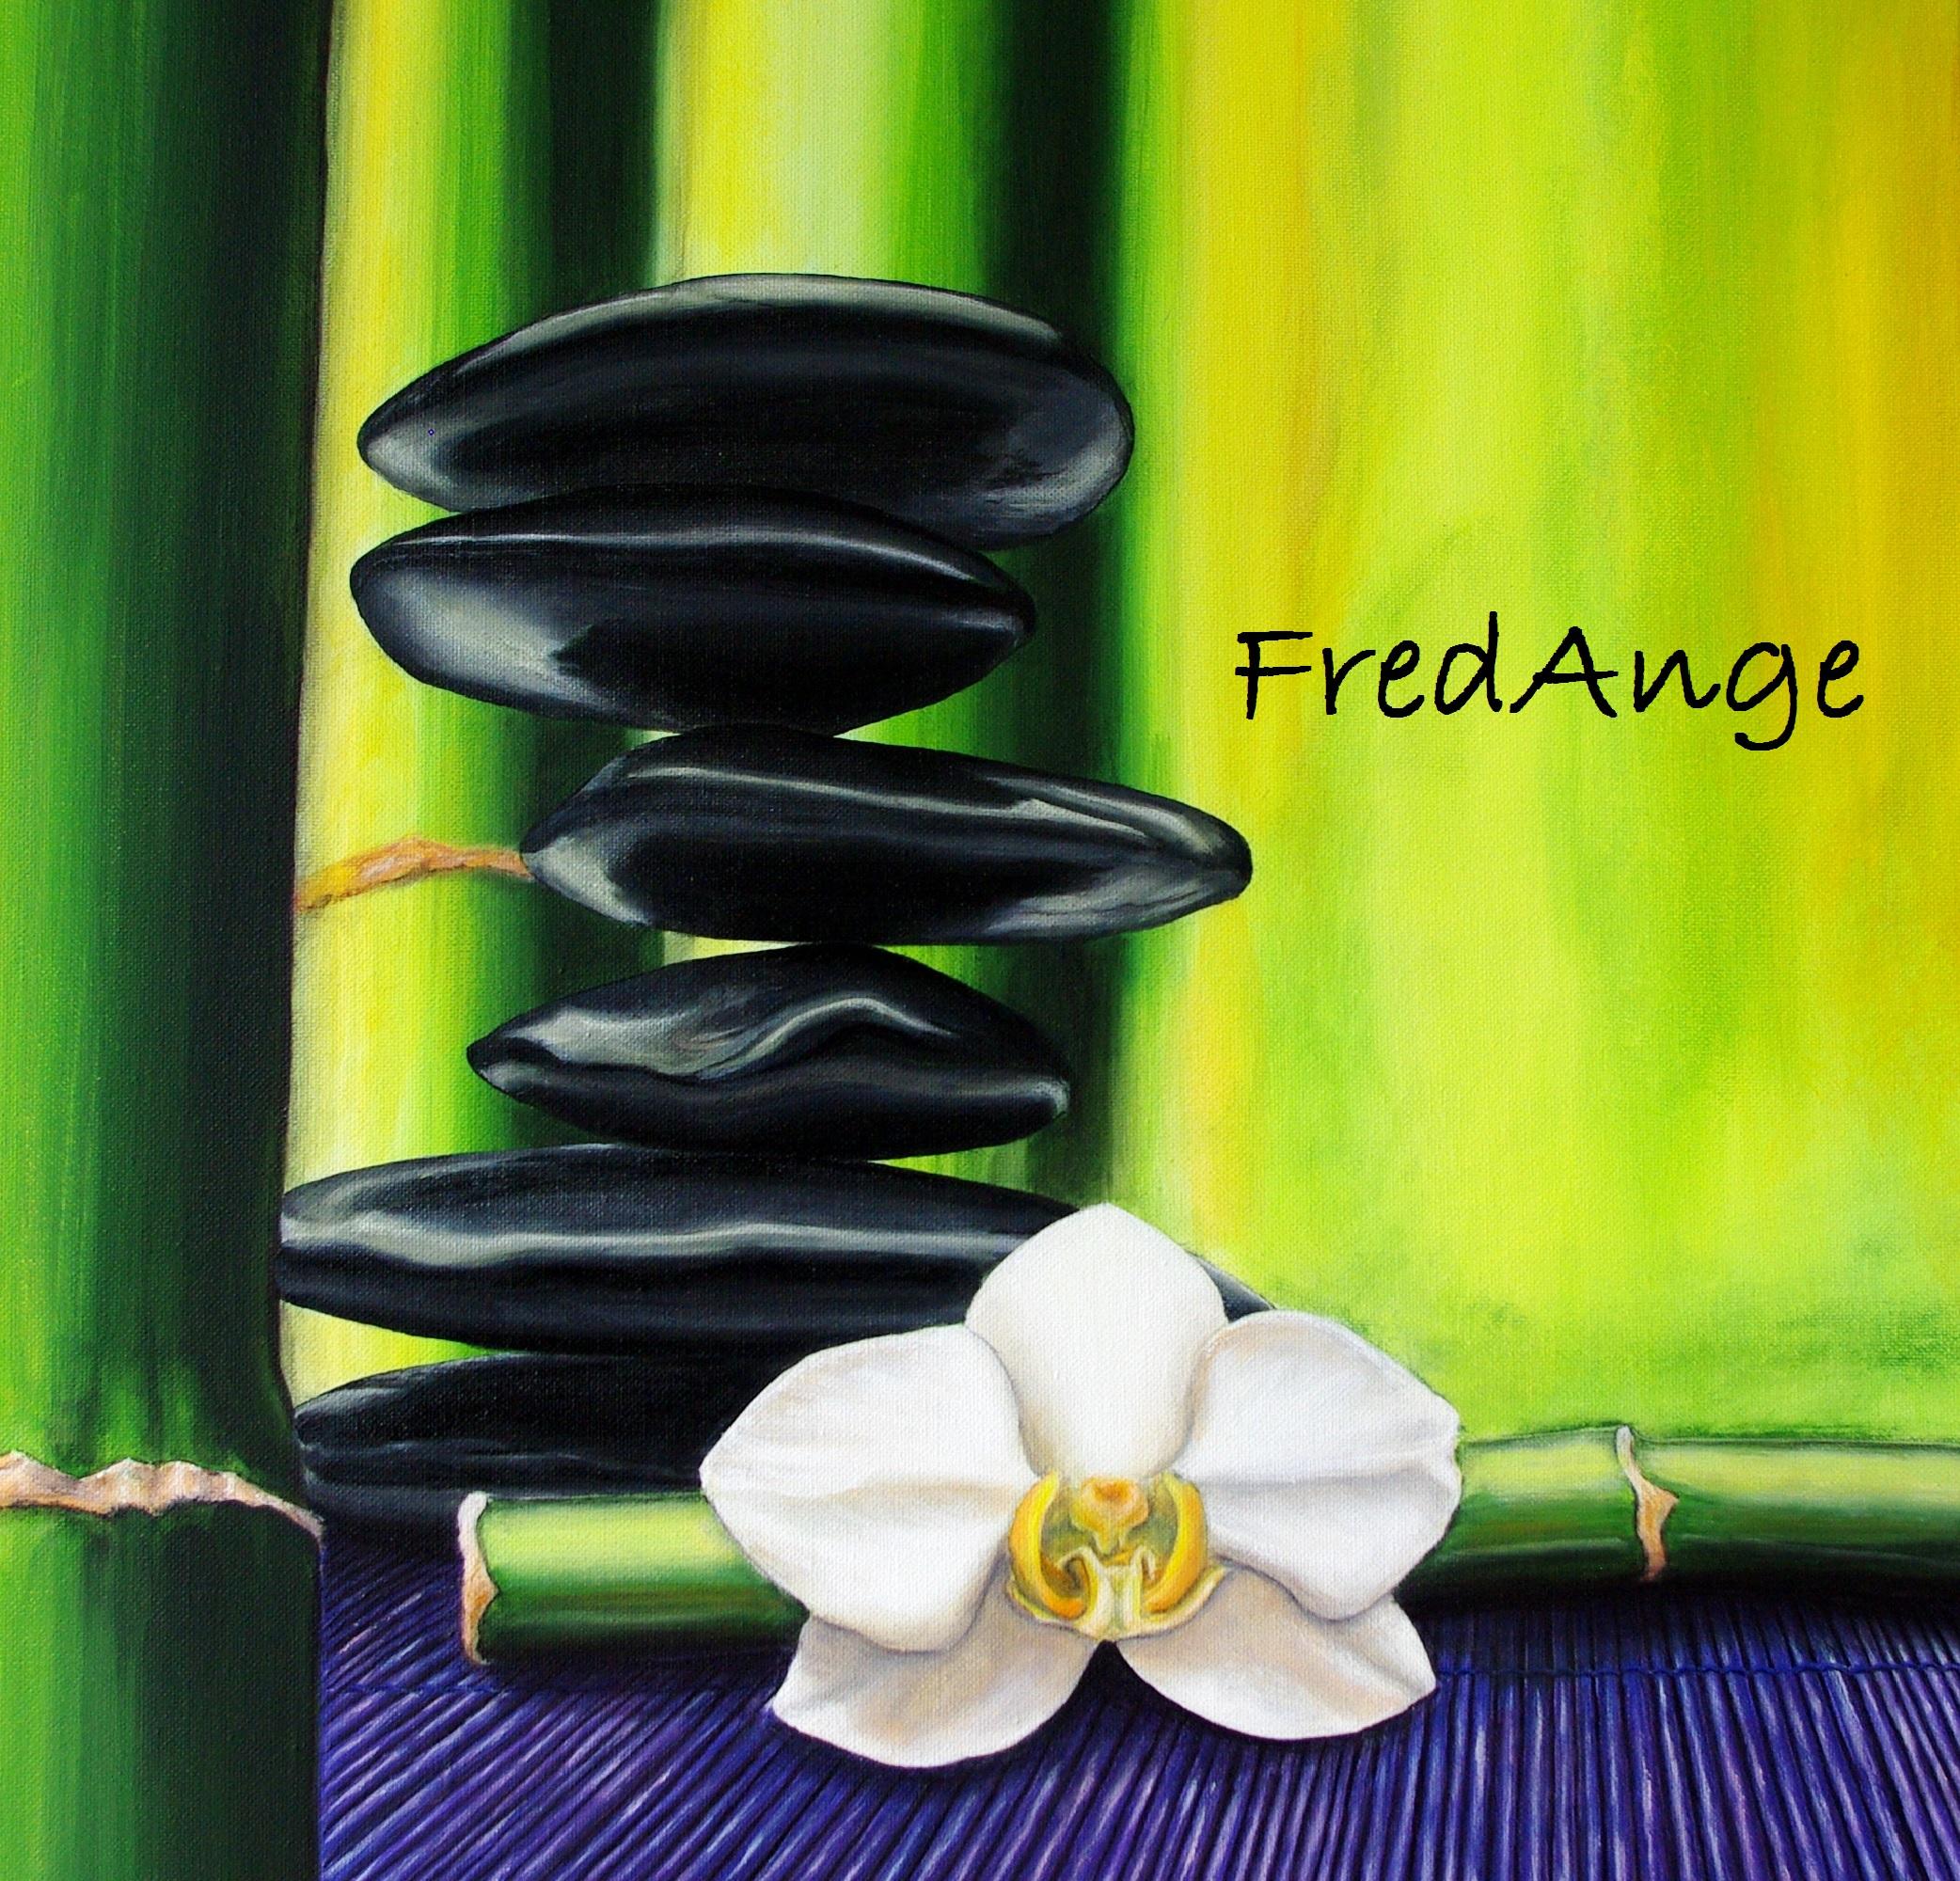 Fred Ange